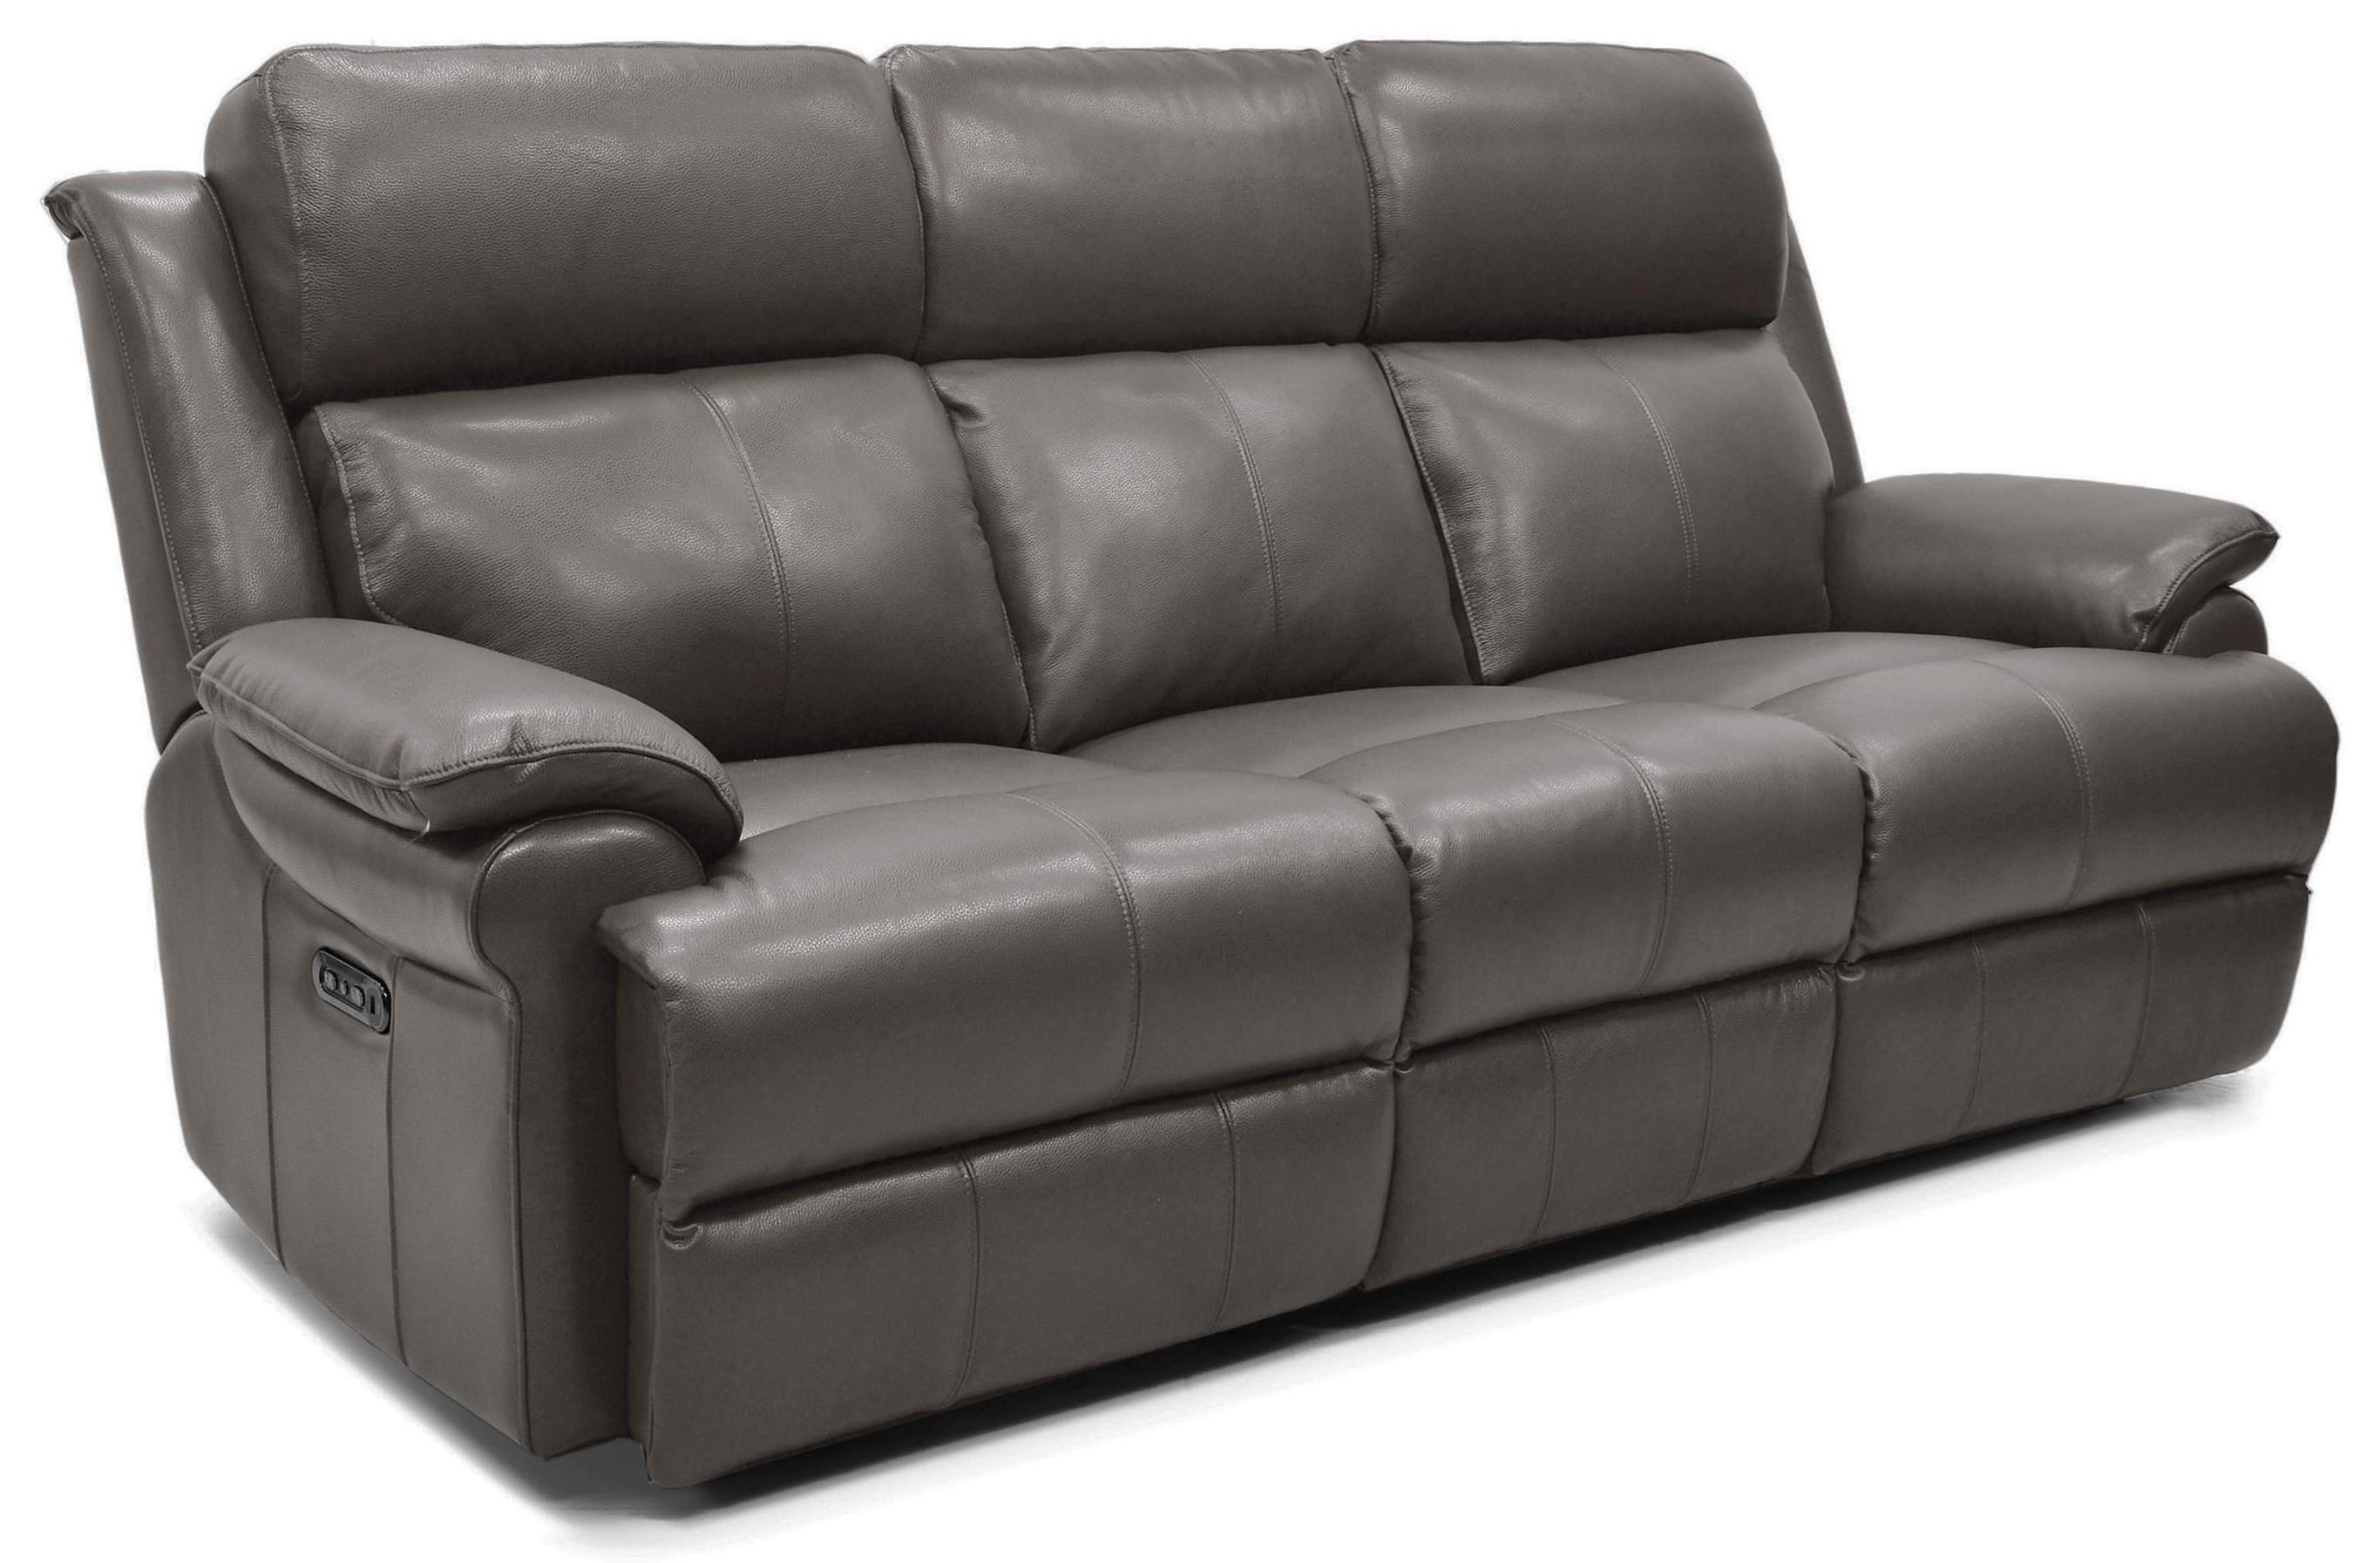 Boynton Power Reclining Leather Sofa at Rotmans